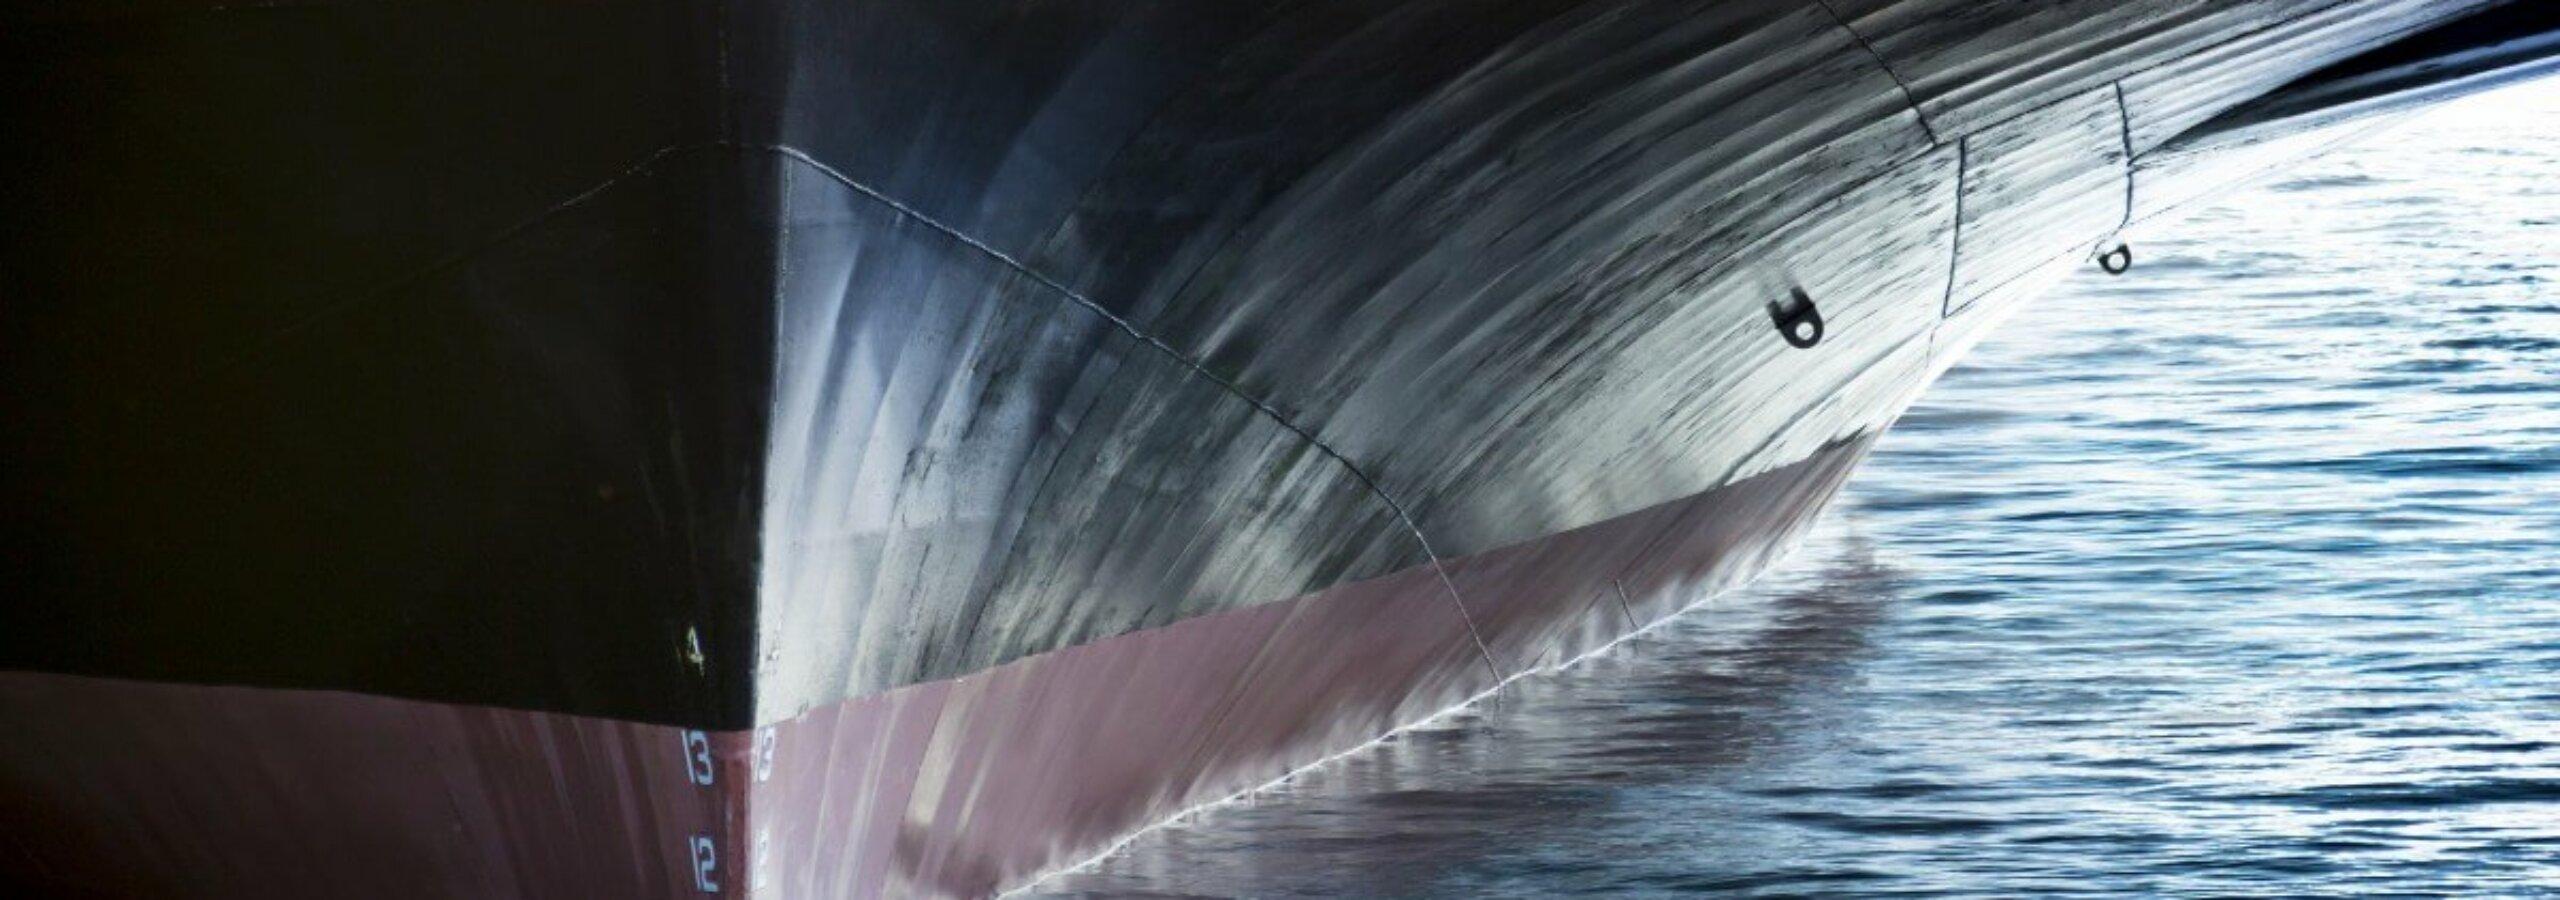 Tysers Insurance Brokers   Hull & Machinery, War, Piracy, Builders' Risk